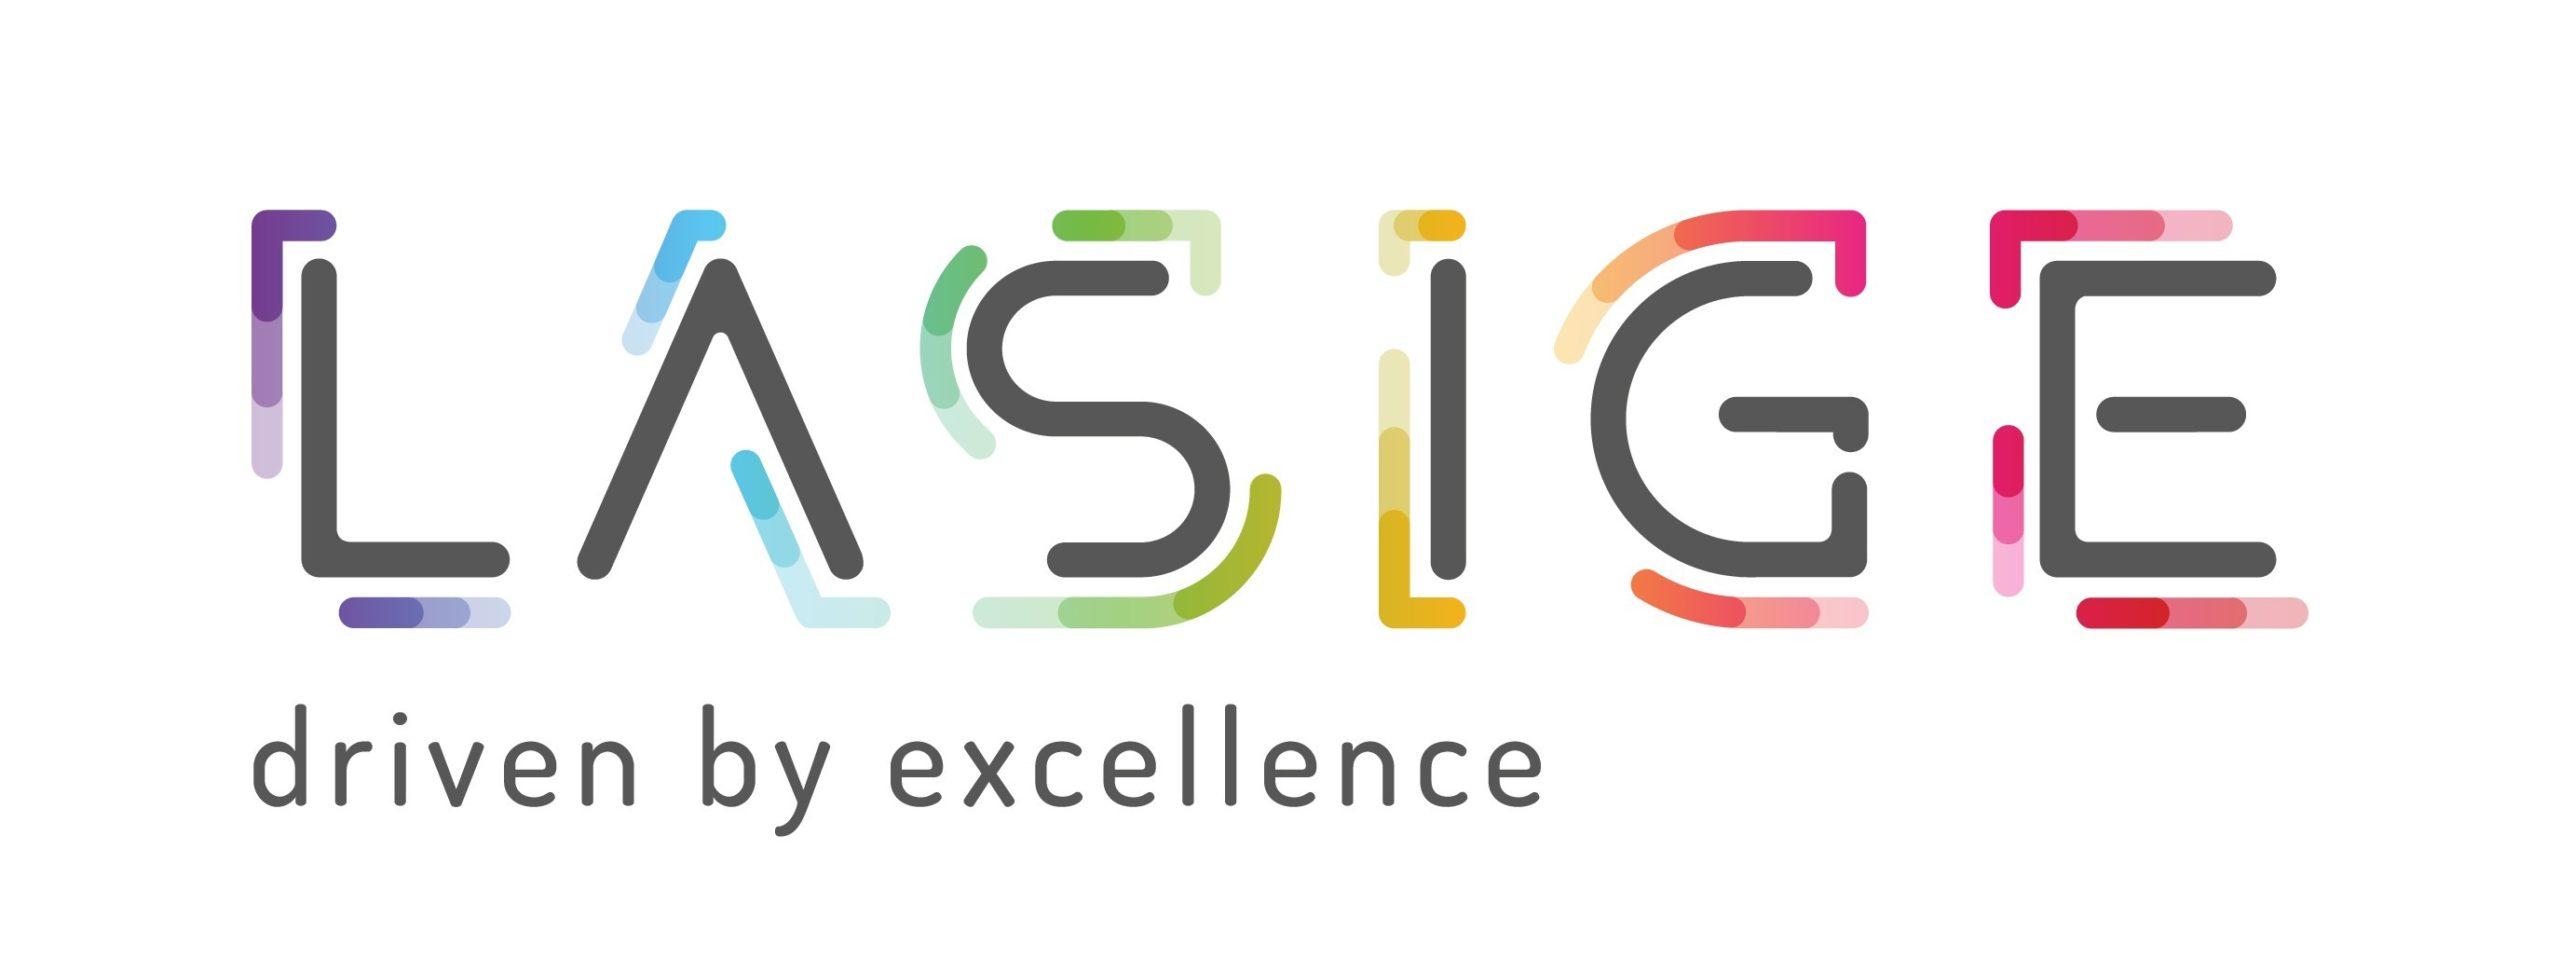 Lasige Logo scaled jpg